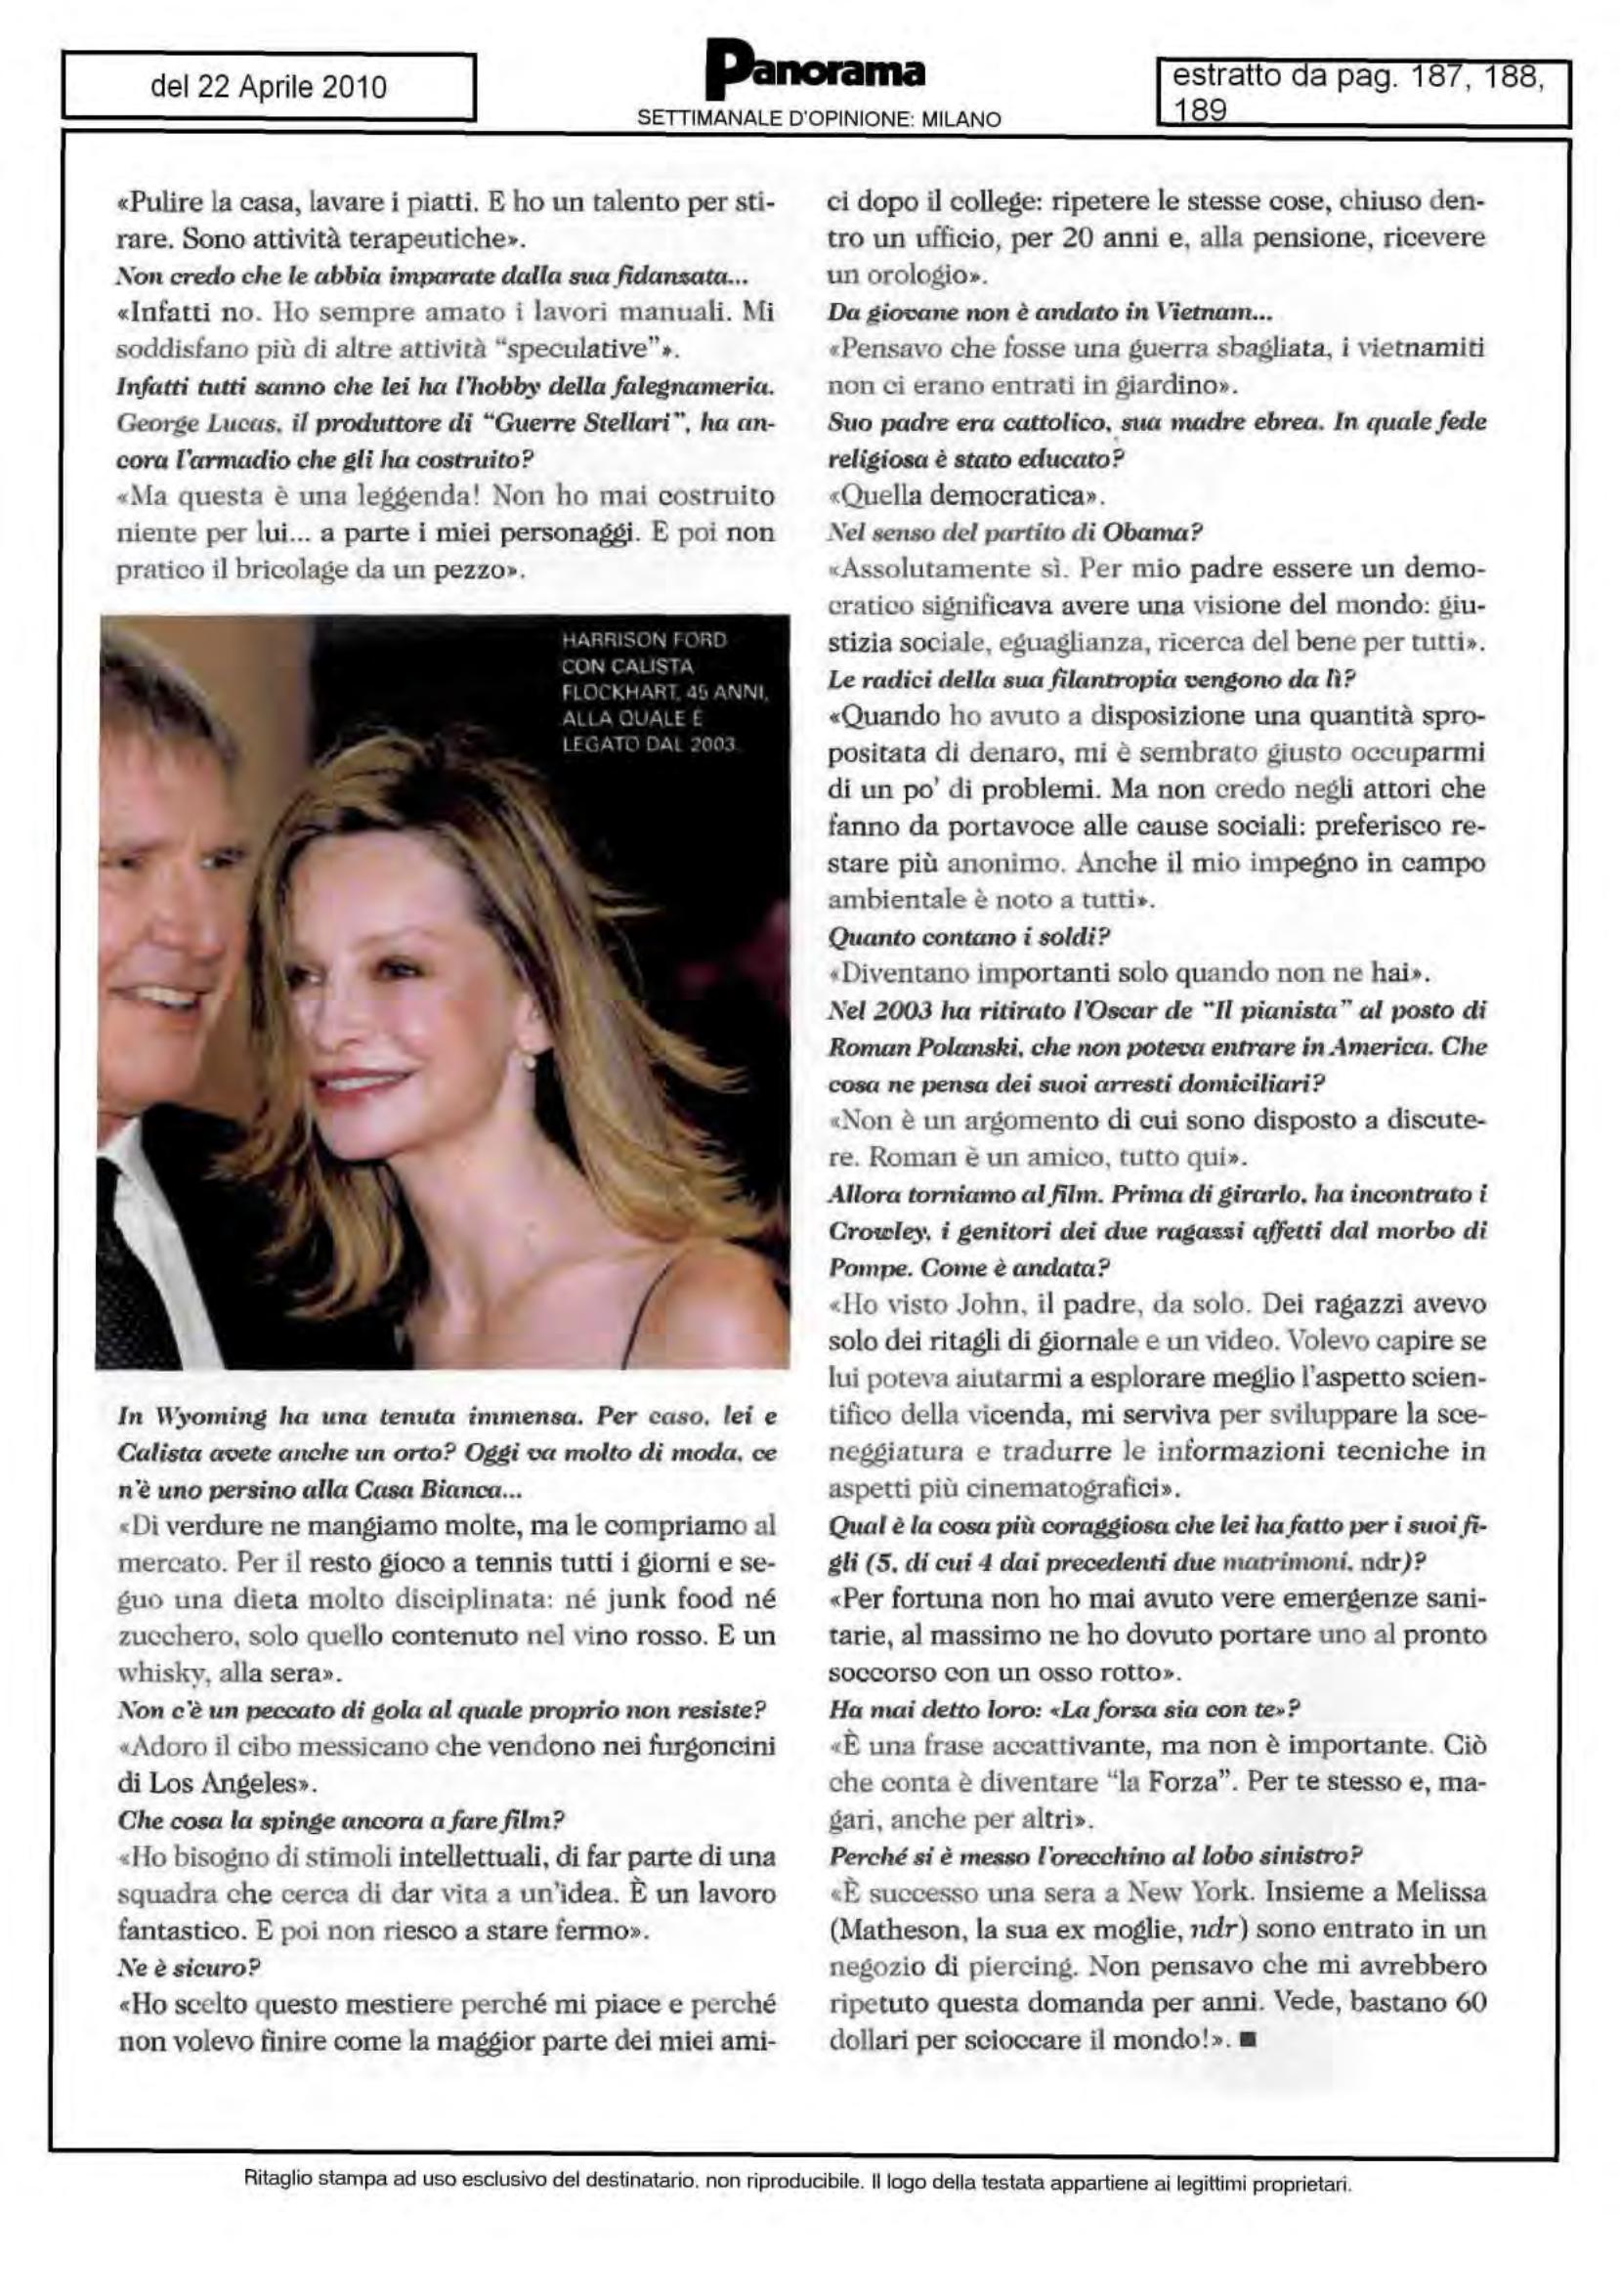 Stampa_20100422_misure straordinarie_Page_15